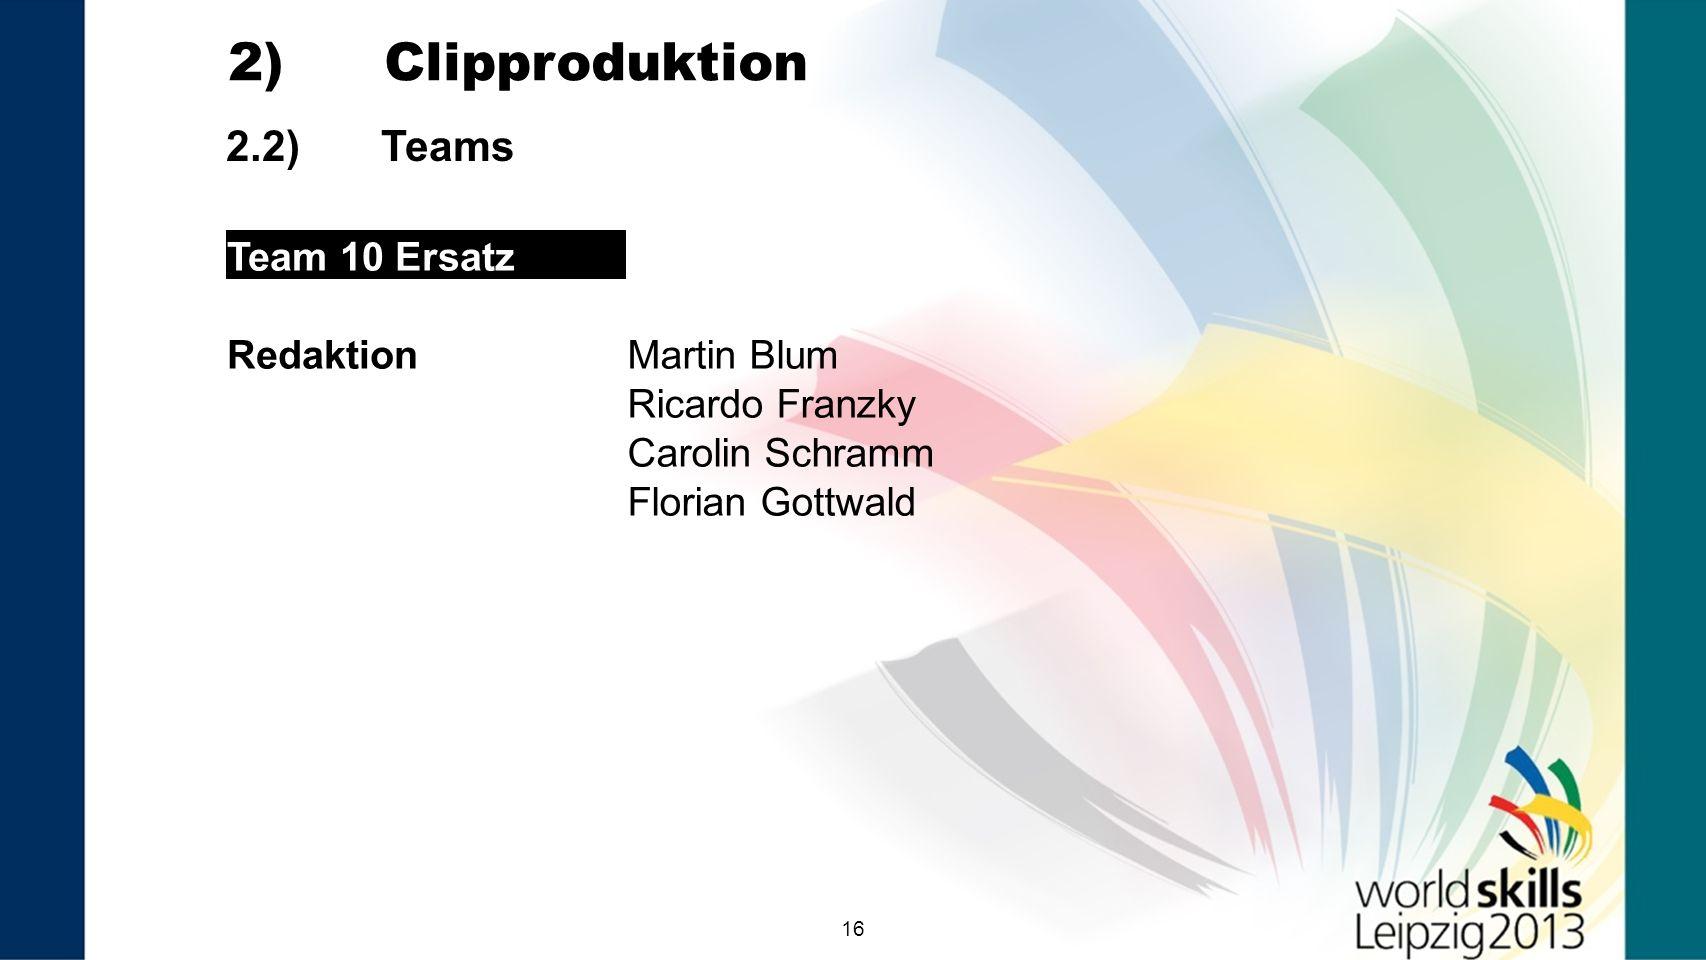 16 2.2) Teams 2) Clipproduktion Team 10 Ersatz RedaktionMartin Blum Ricardo Franzky Carolin Schramm Florian Gottwald Team 9 VNR